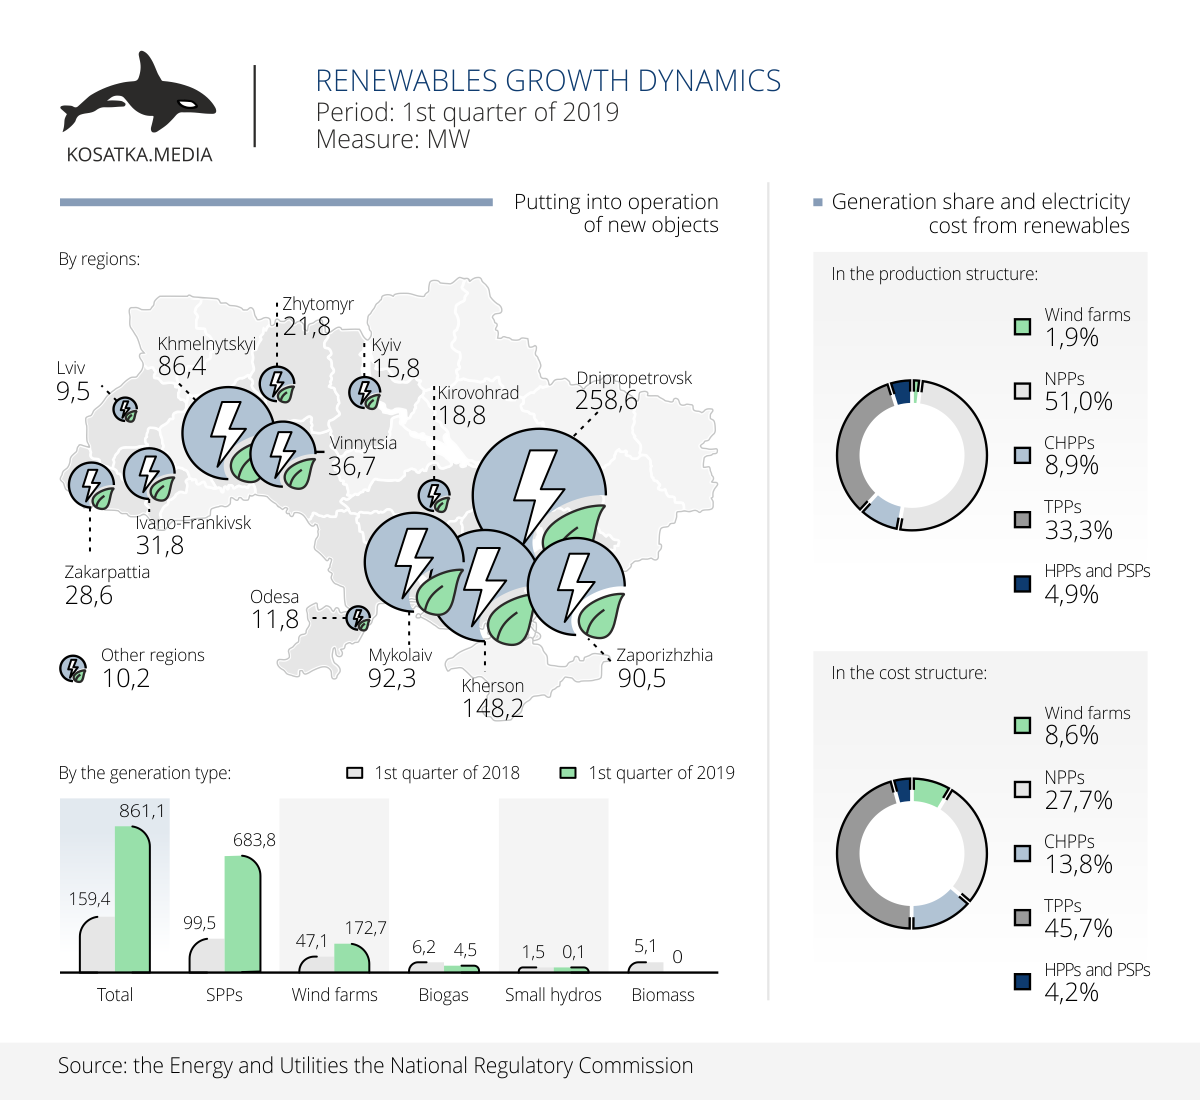 Renewables growth dynamics